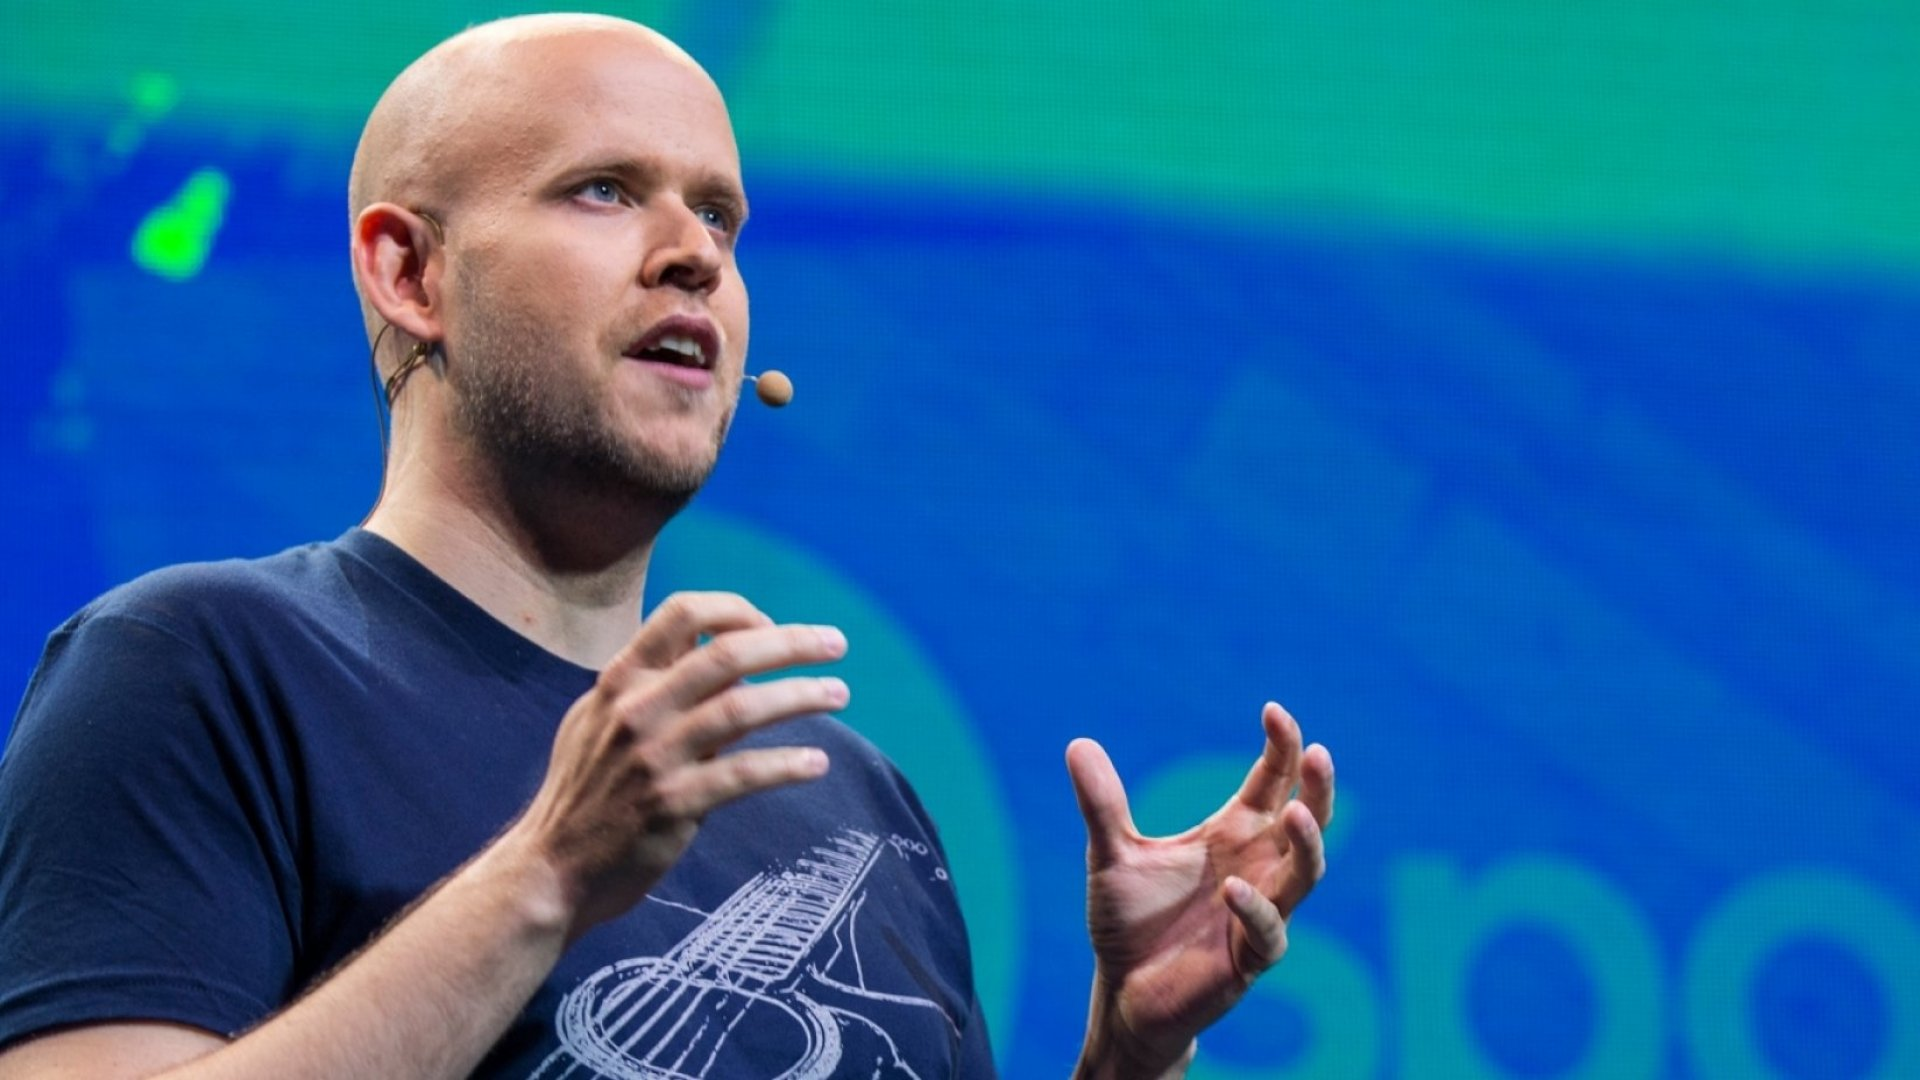 Daniel Ek, CEO and founder of Spotify.